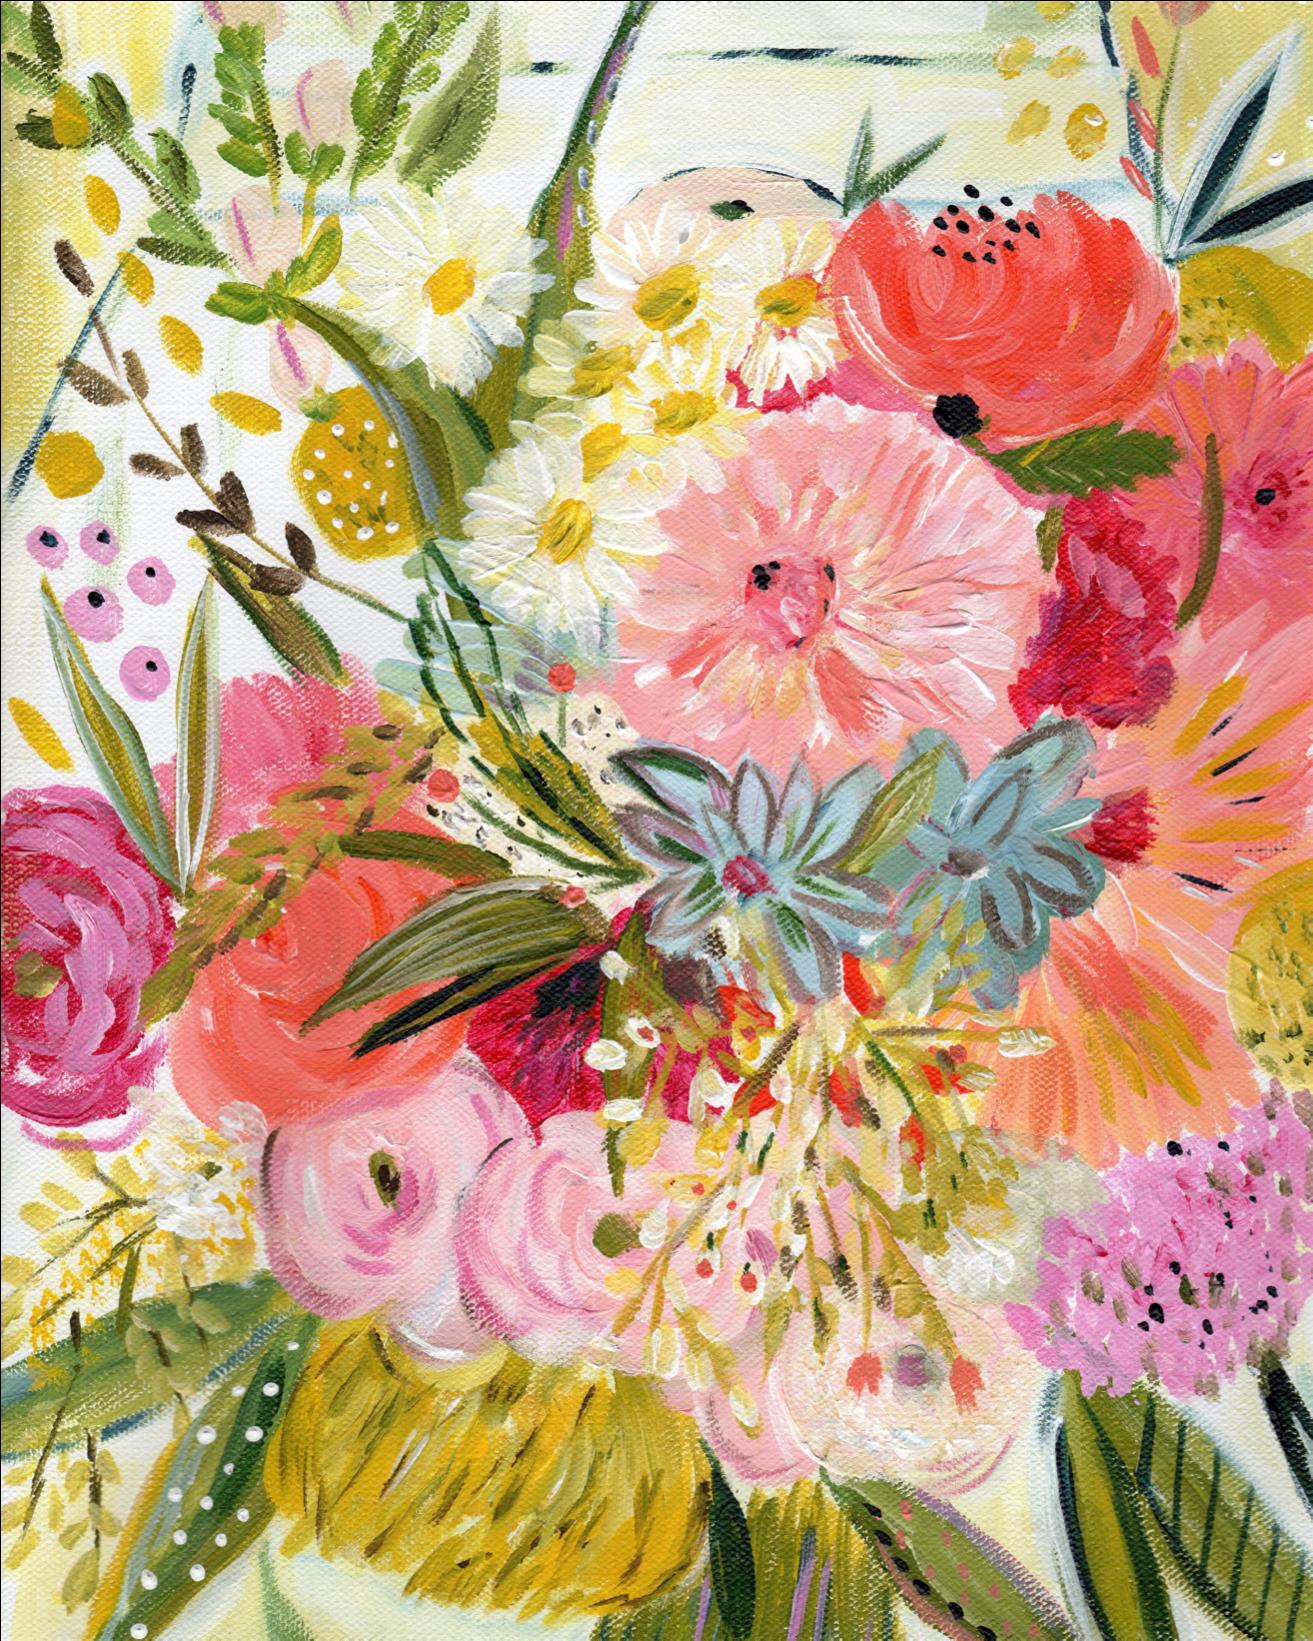 A Bouquet For Jeni Art Print Bouquet Painting Clipart Full Size Clipart 4238797 Pinclipart